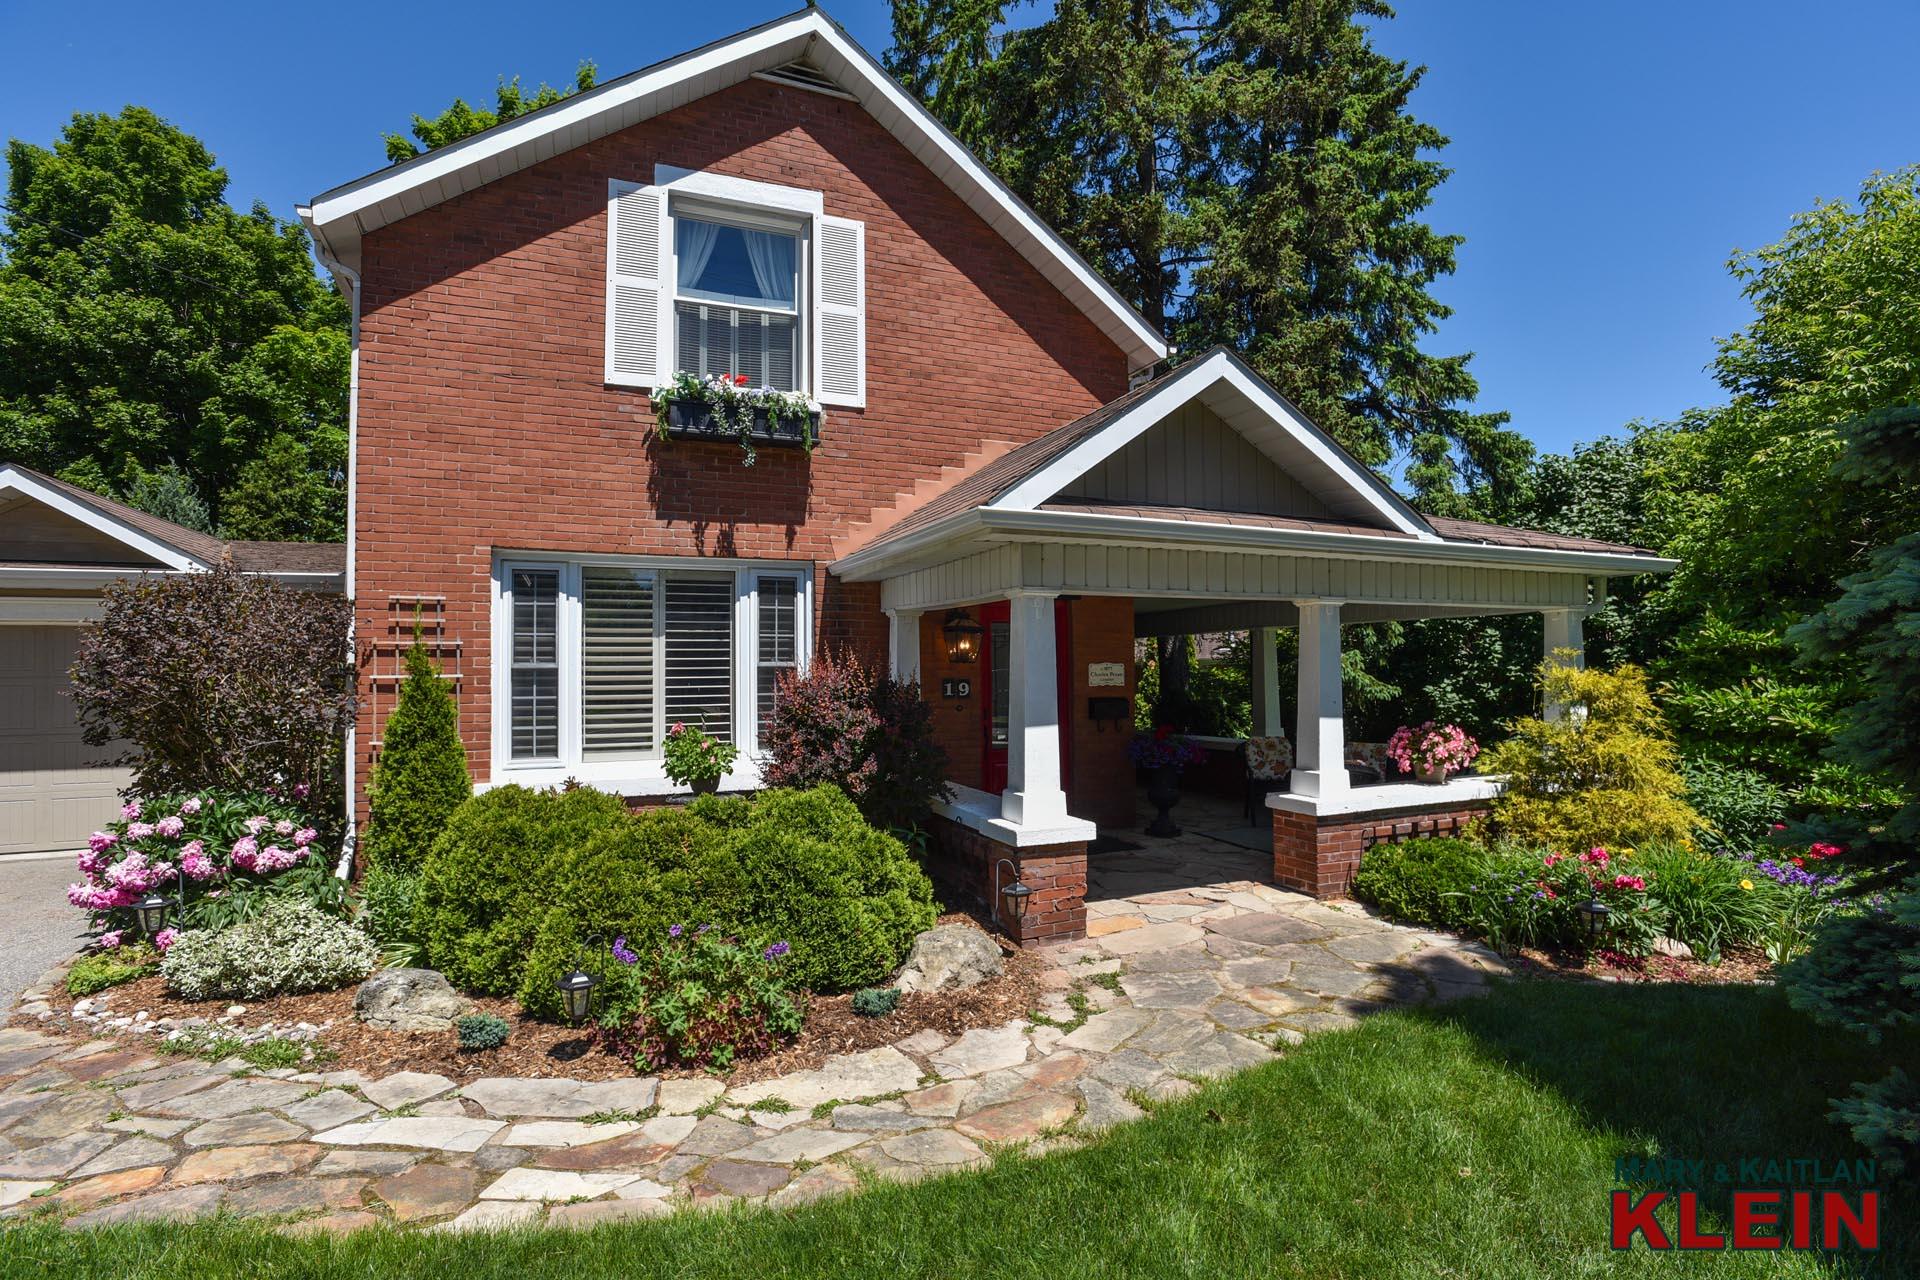 Century Home for Sale, Orangeville, Home for sale, Mary Klein, Kaitlan Klein